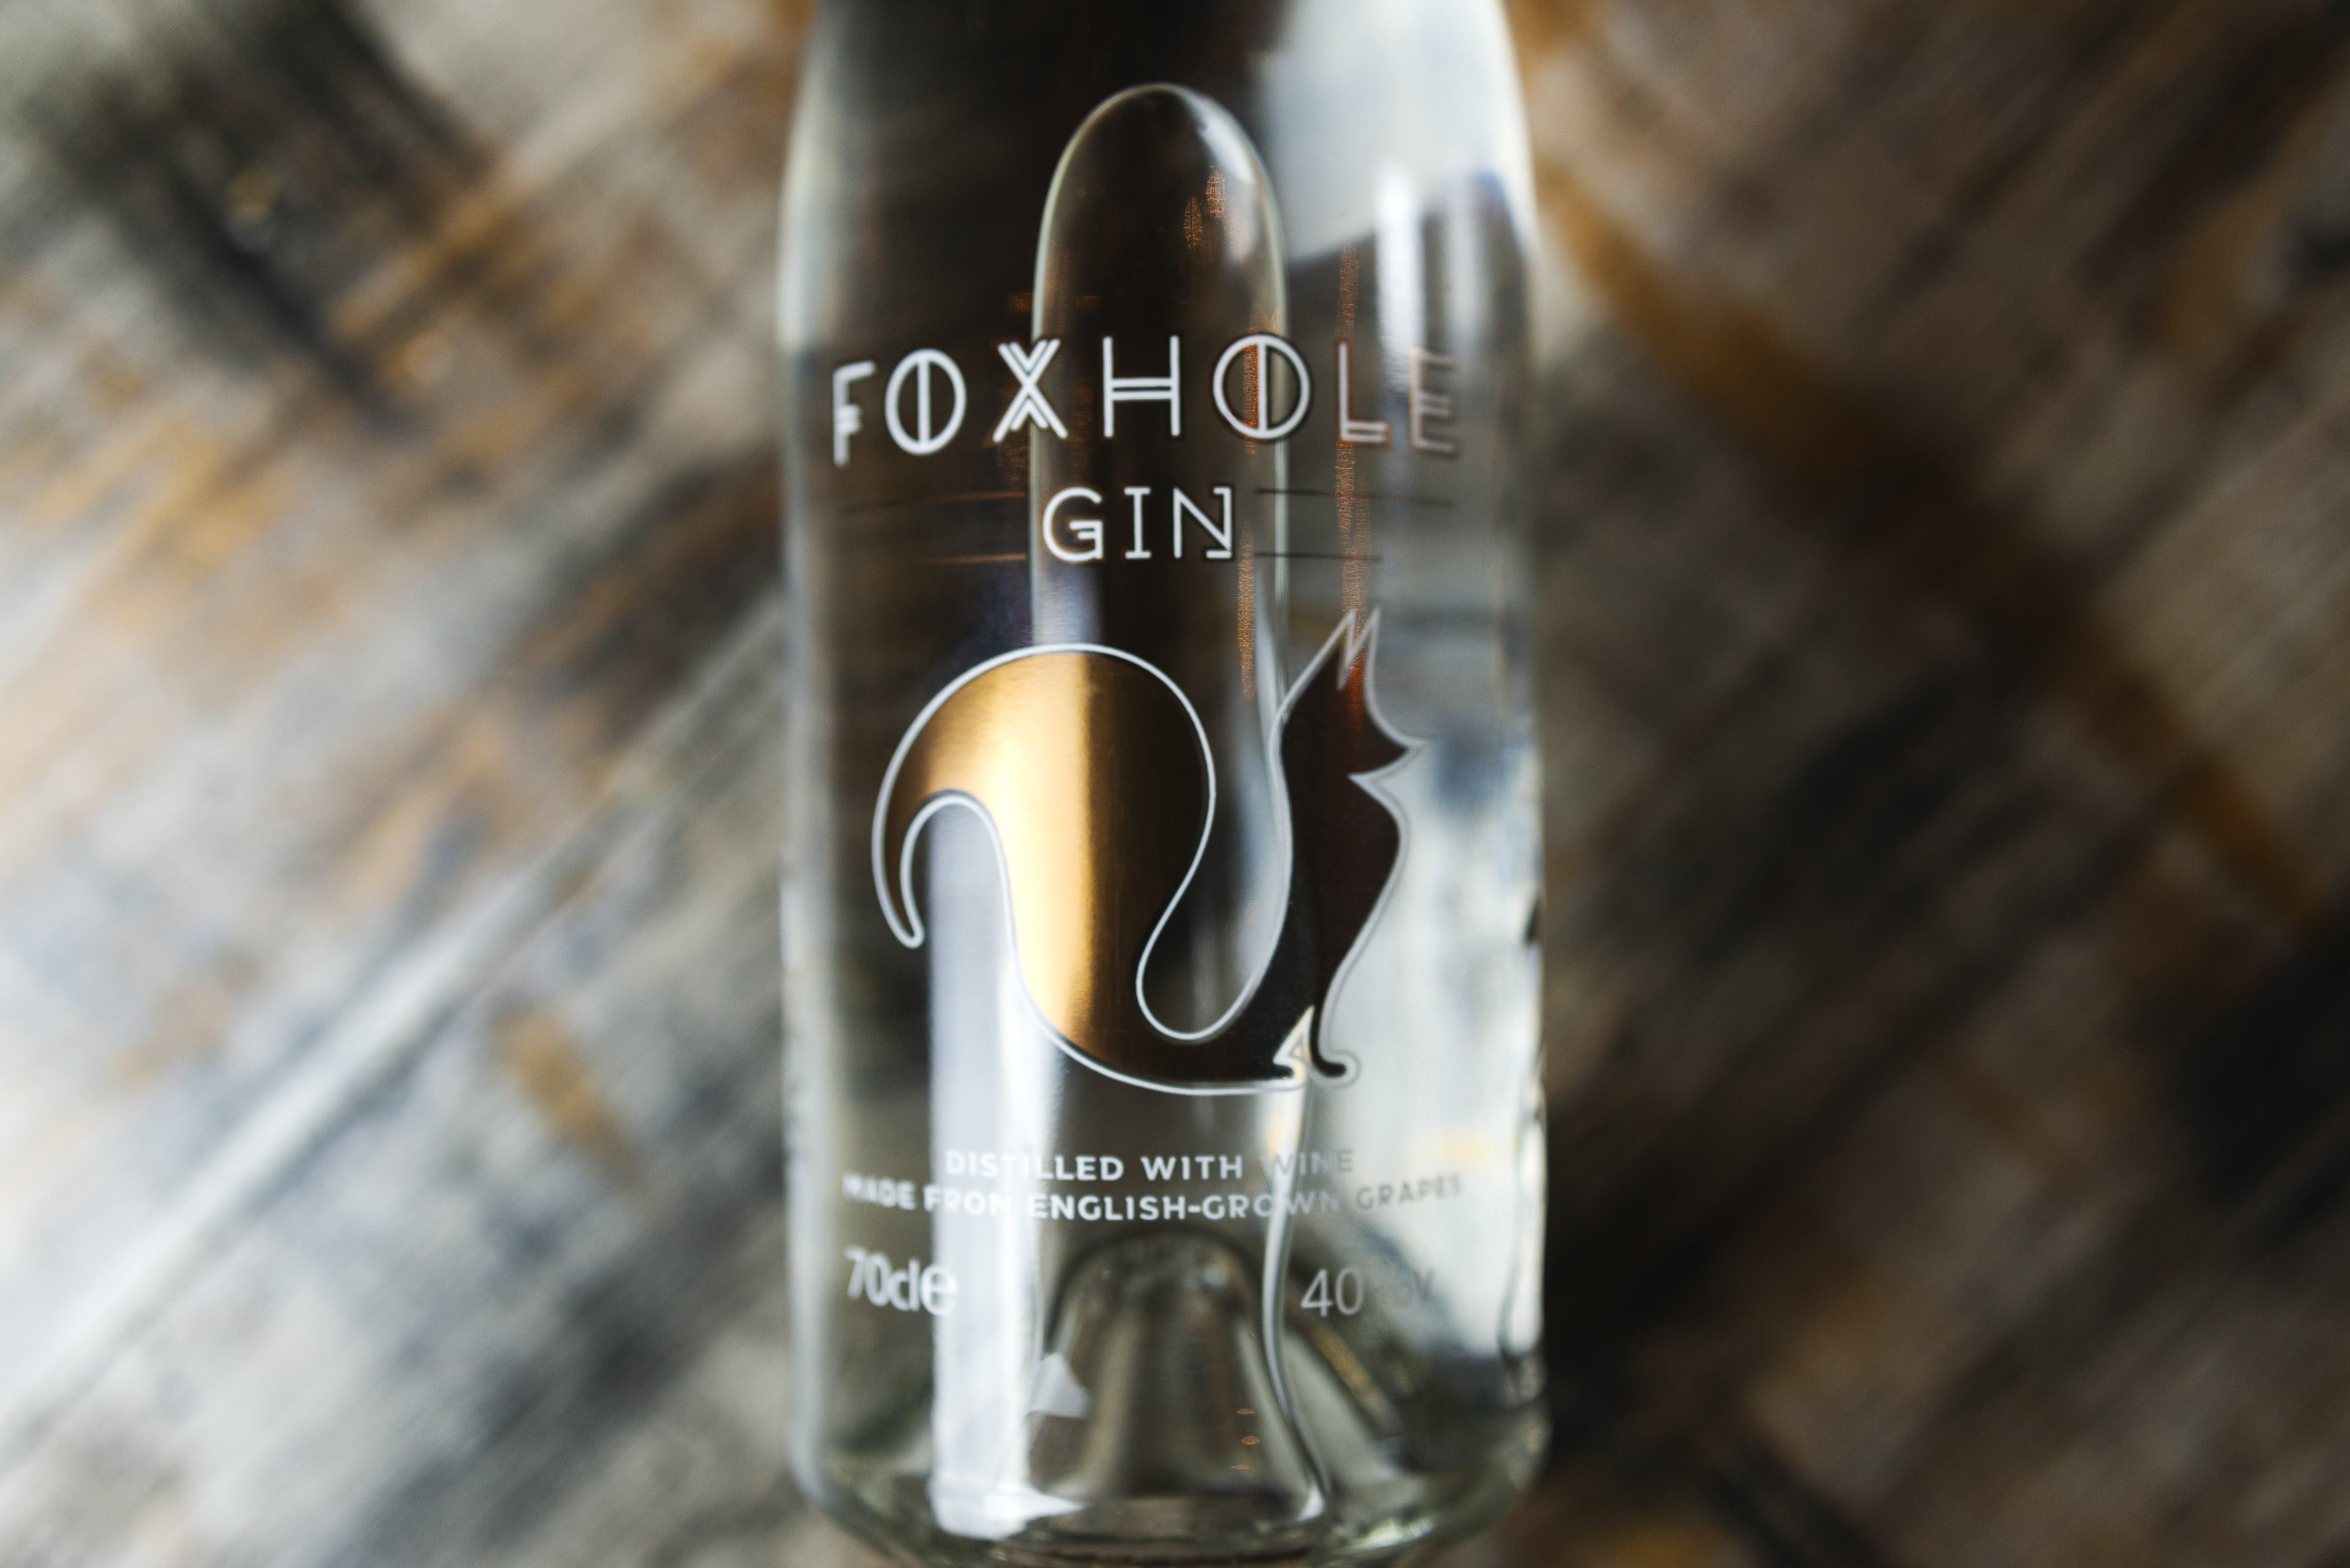 Foxhole Gin Bottle